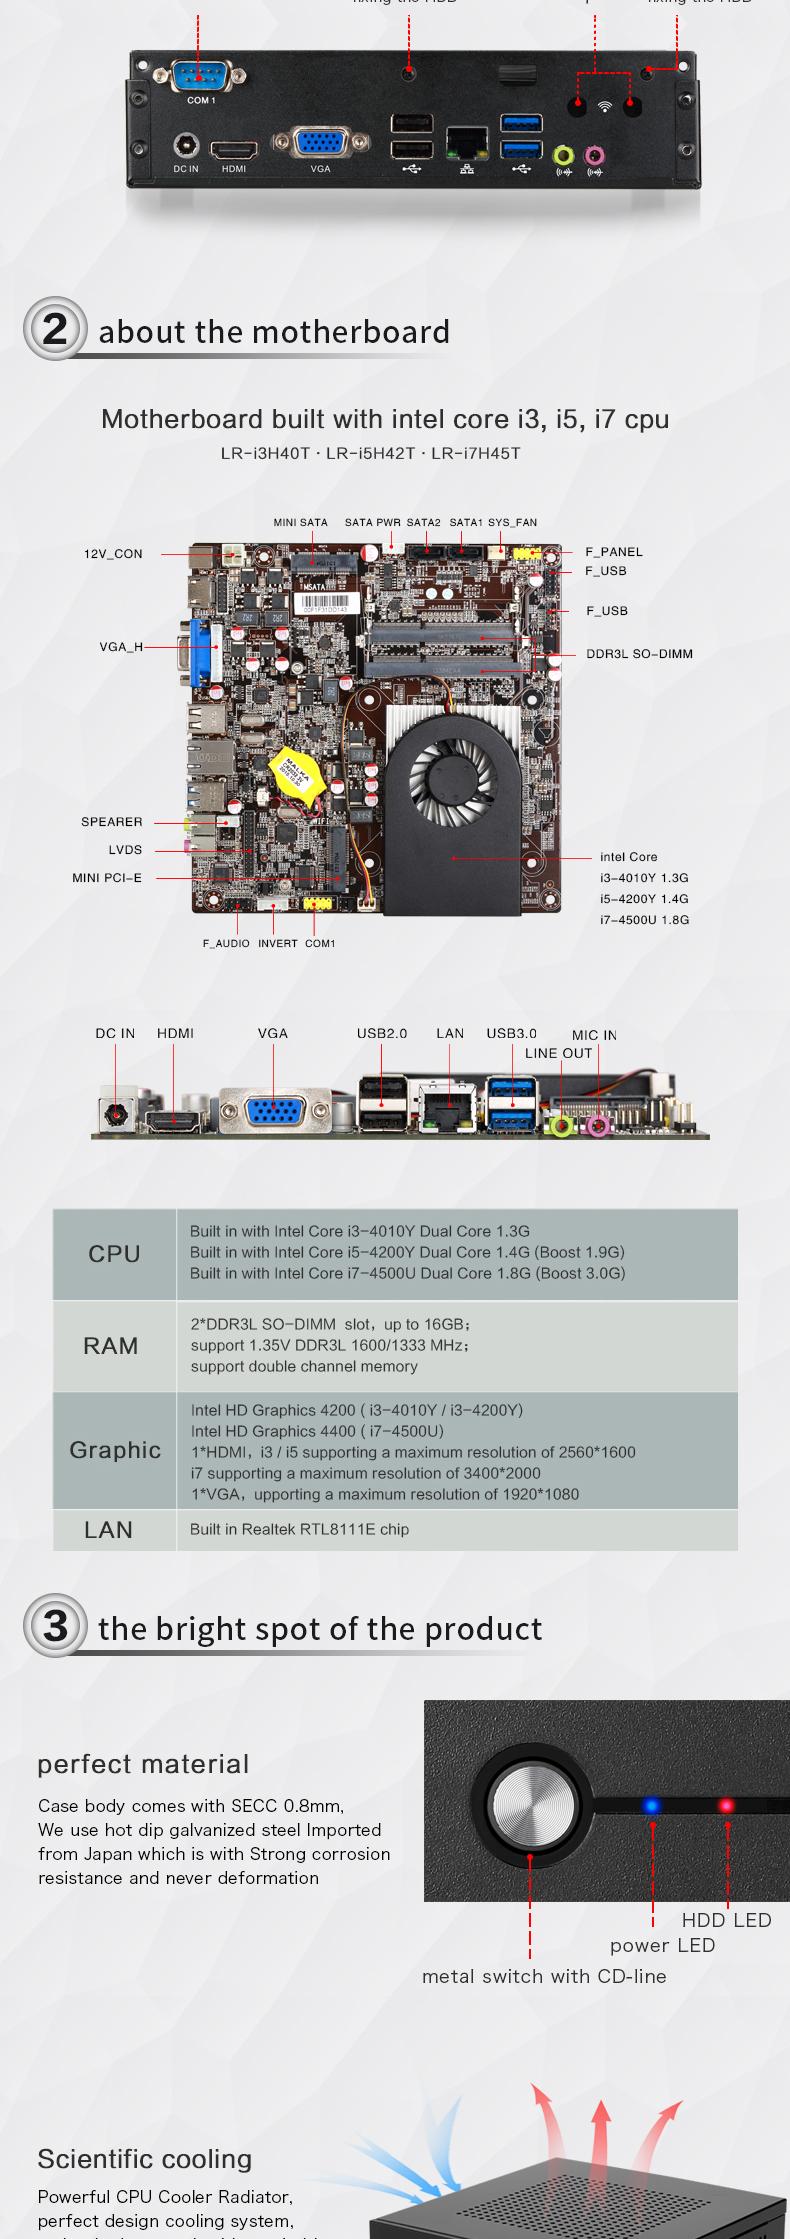 Intel Mini Pc Windows 10 Linux Desktop Computers I3 Core I7 Mini Pc I5  Support Mic 8g Ram 8g Ssd - Buy Mini Pc Windows 10,Intel Mini Pc,Linux  Desktop